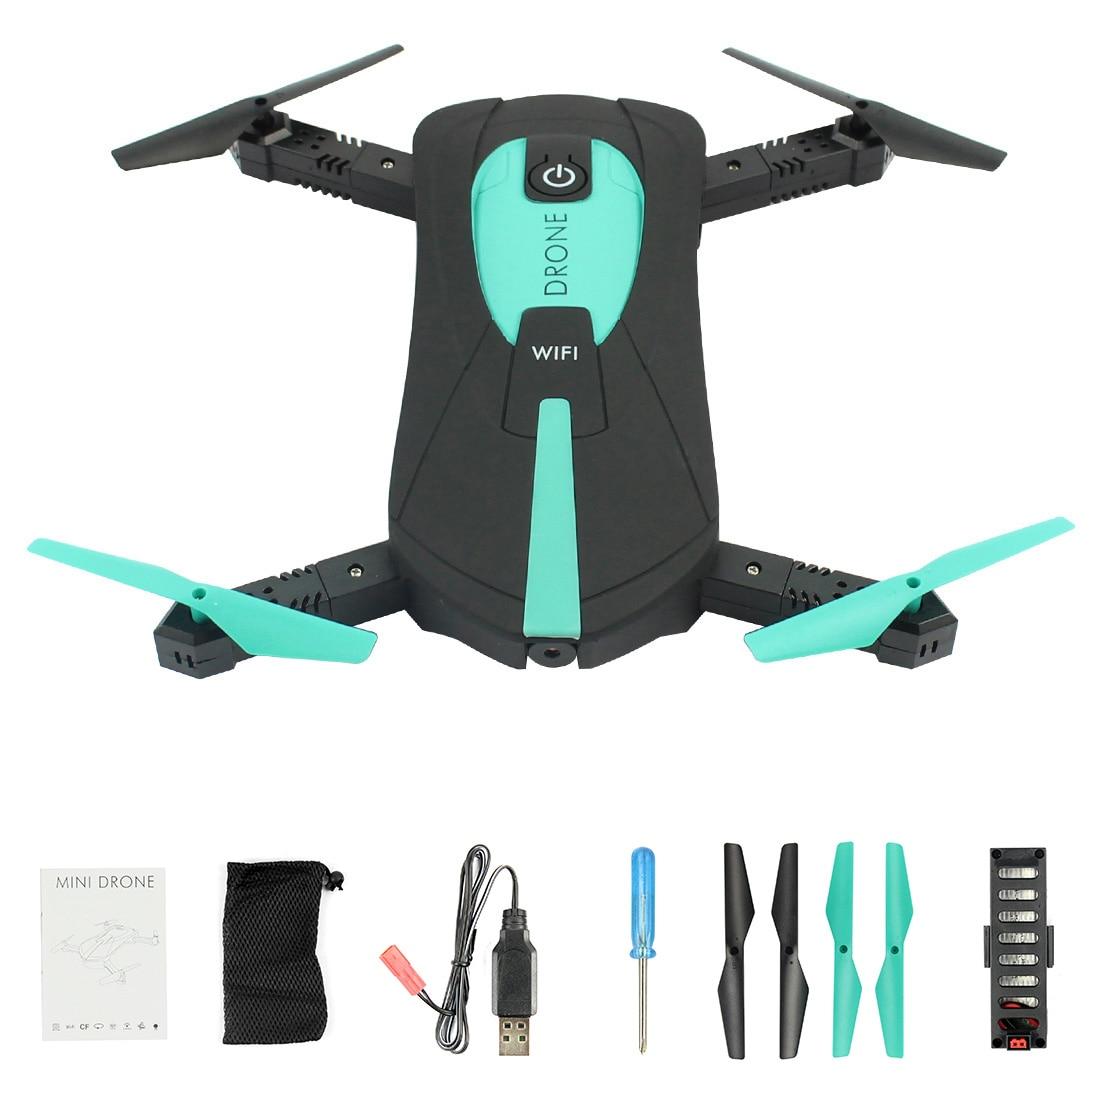 JY018 ELFIE WiFi FPV Quadcopter Mini Faltbare Selfie Drohne RC Drone mit 0.3MP/2MP Kamera HD FPV RC Hubschrauber